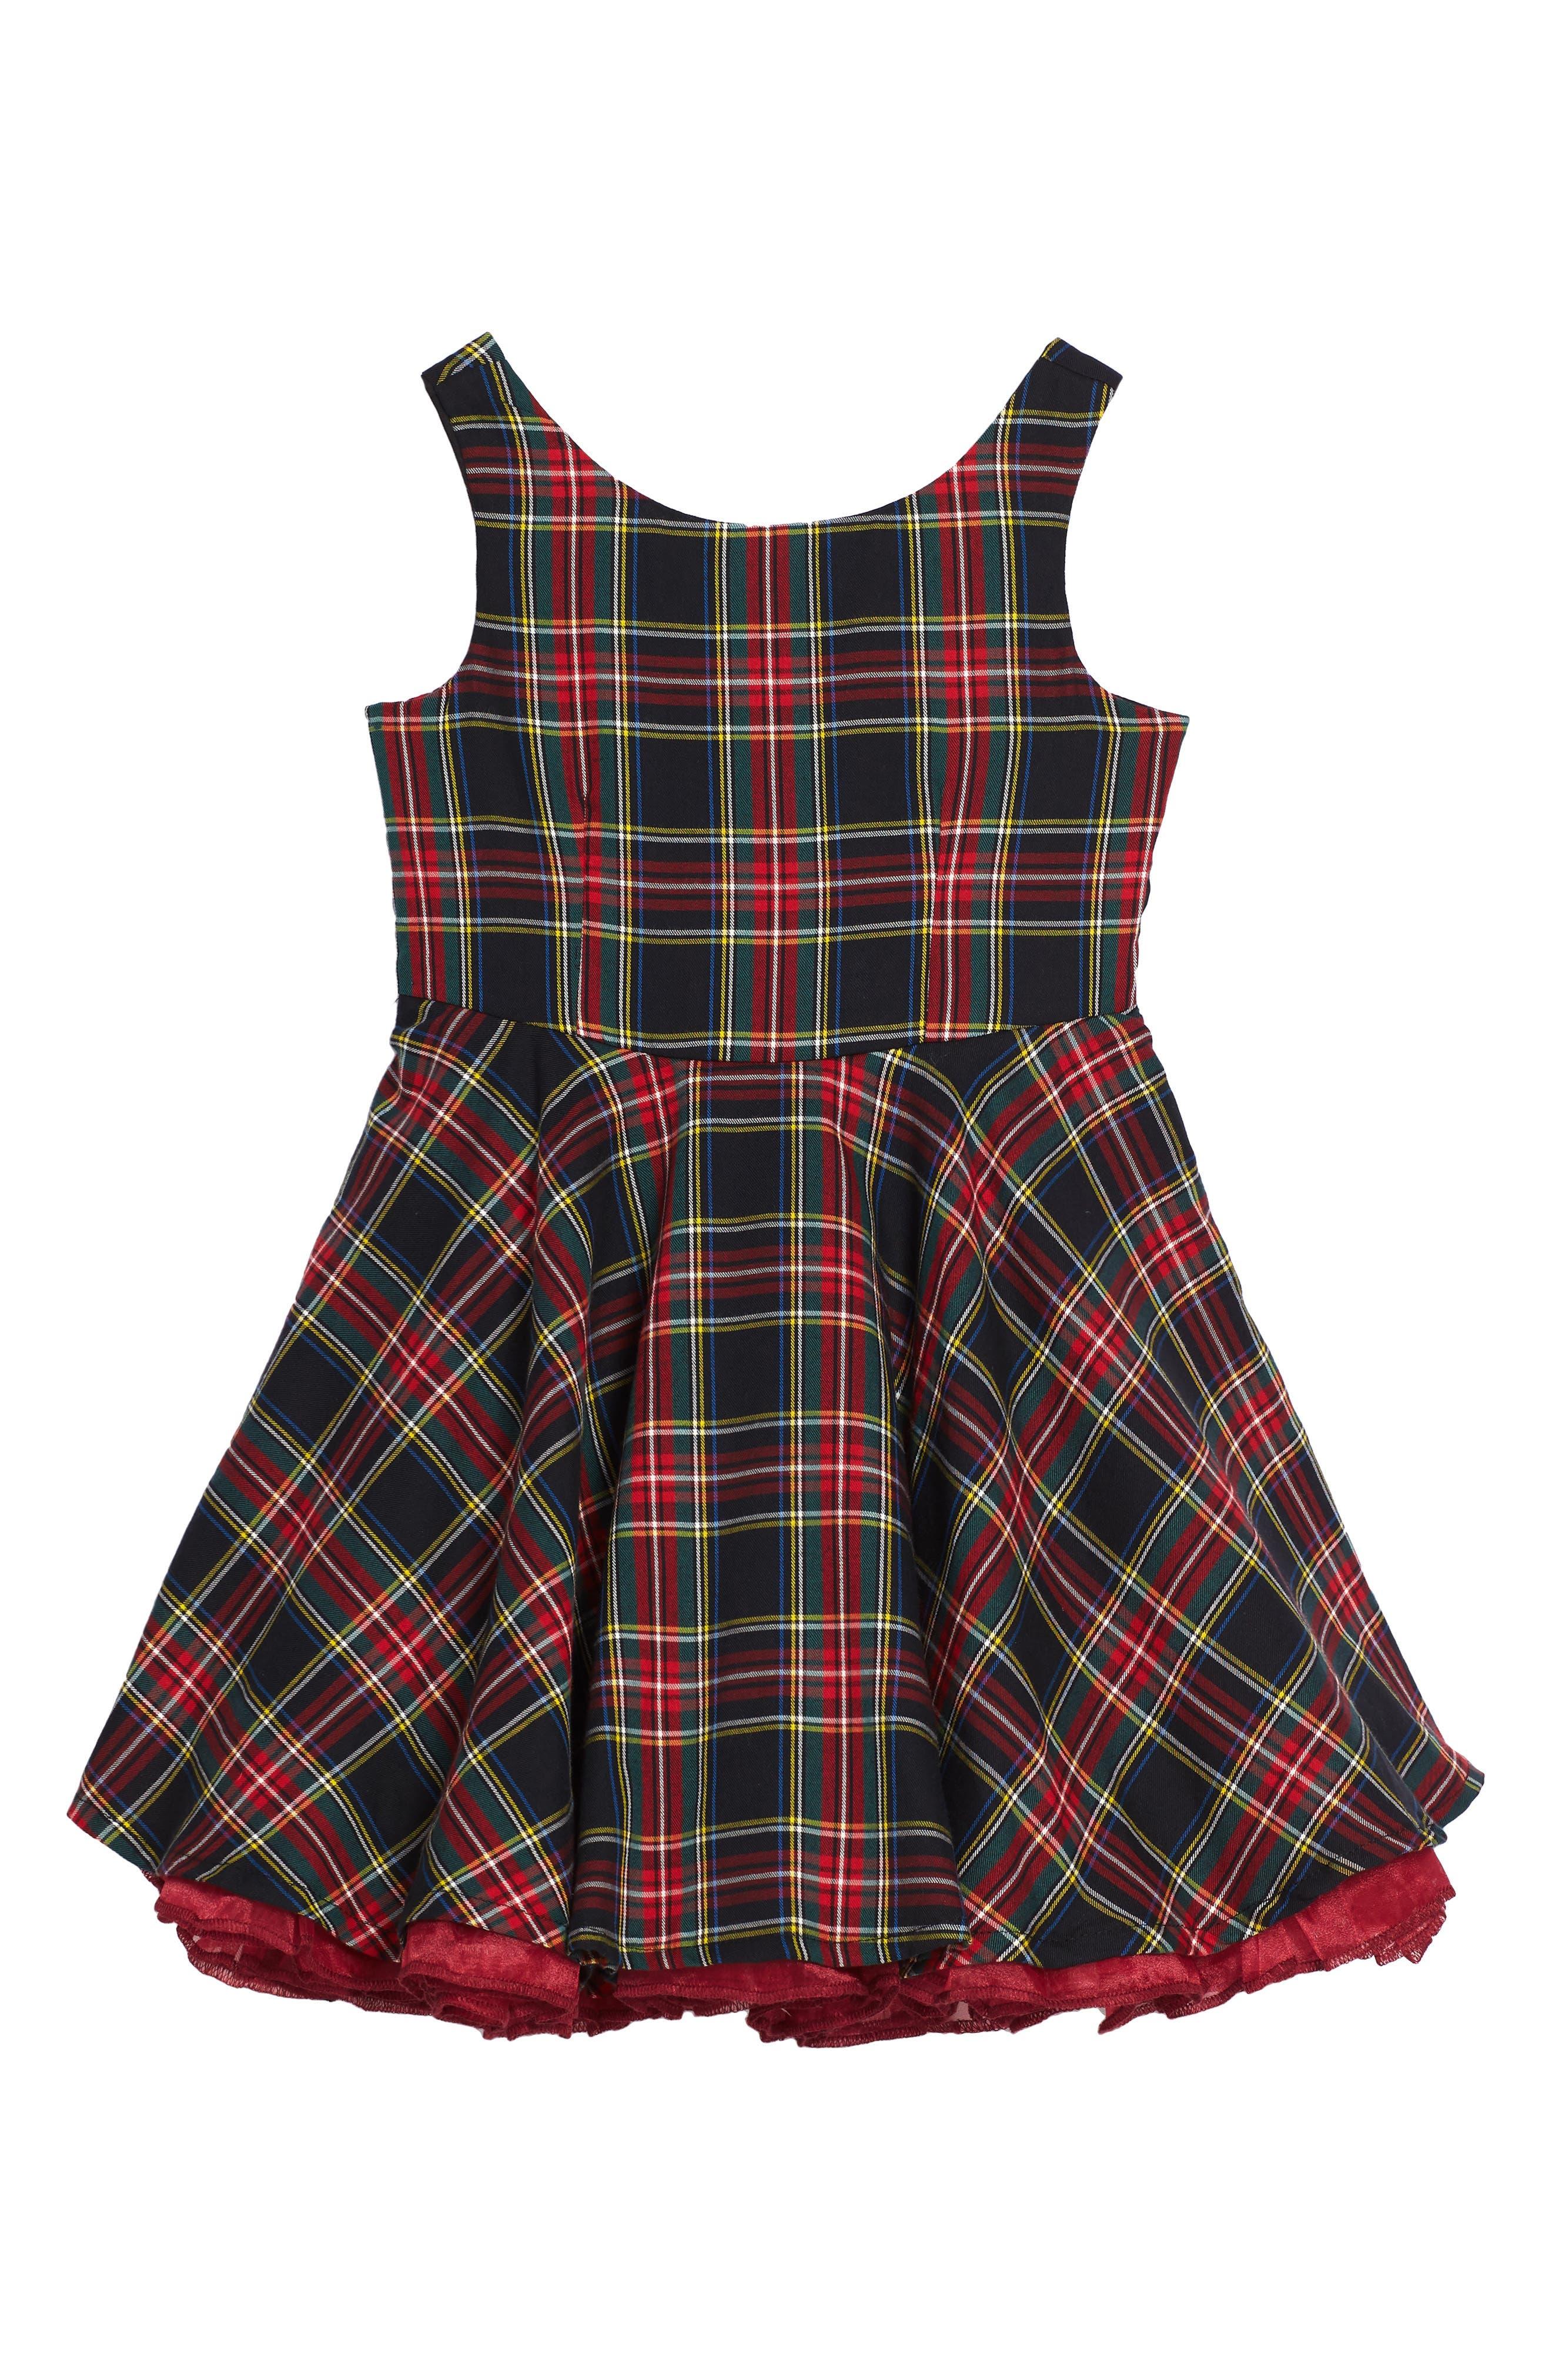 Tartan Party Dress,                         Main,                         color, Red Plaid